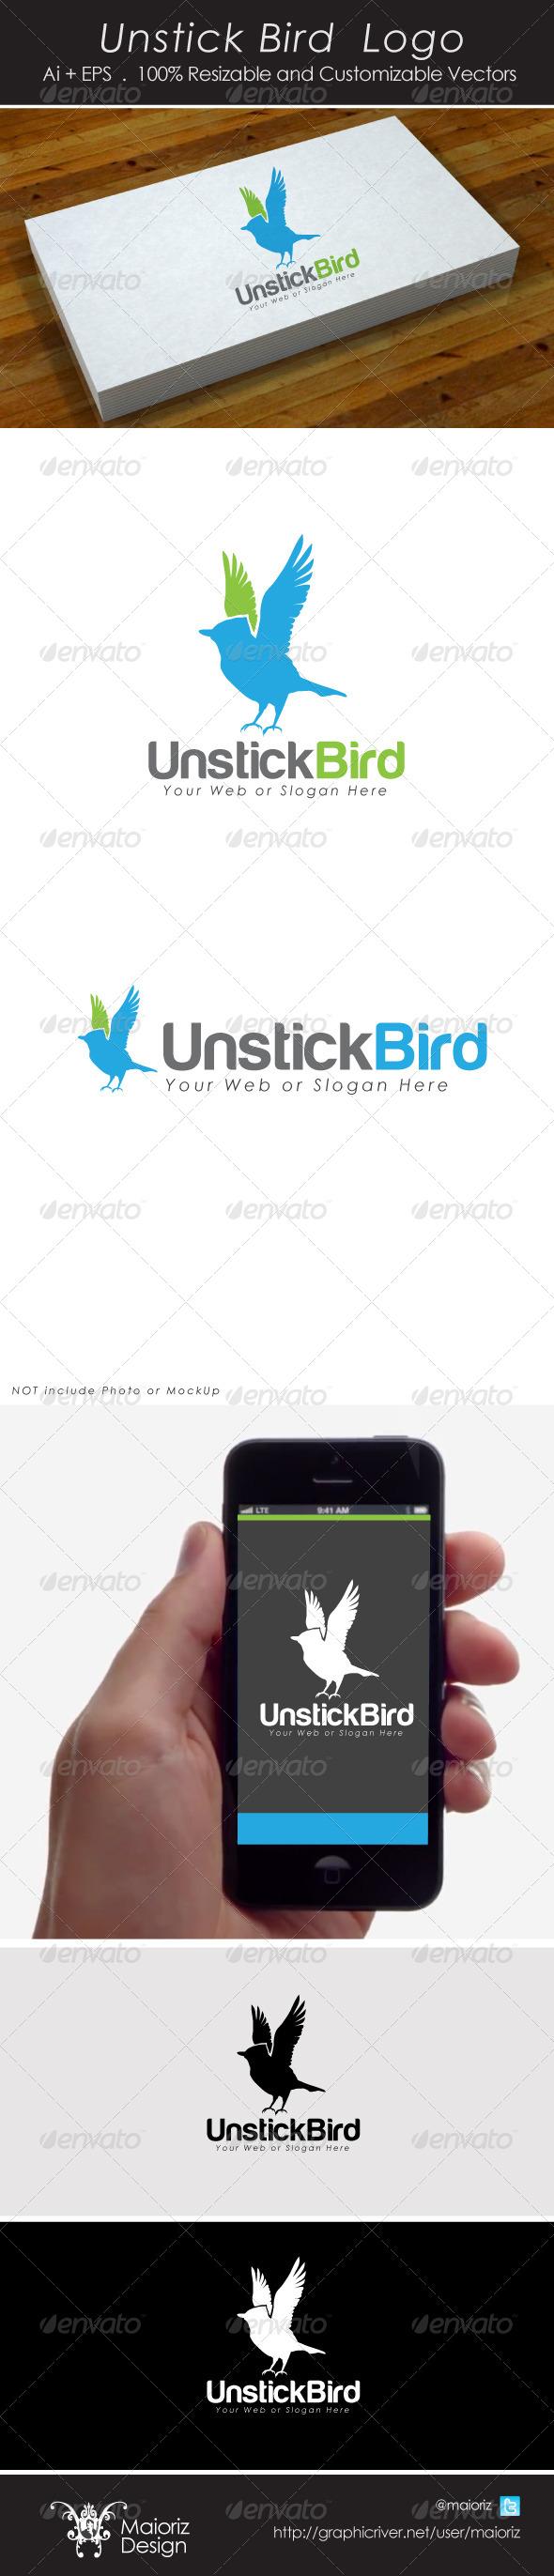 GraphicRiver Unstick Bird Logo 4307430